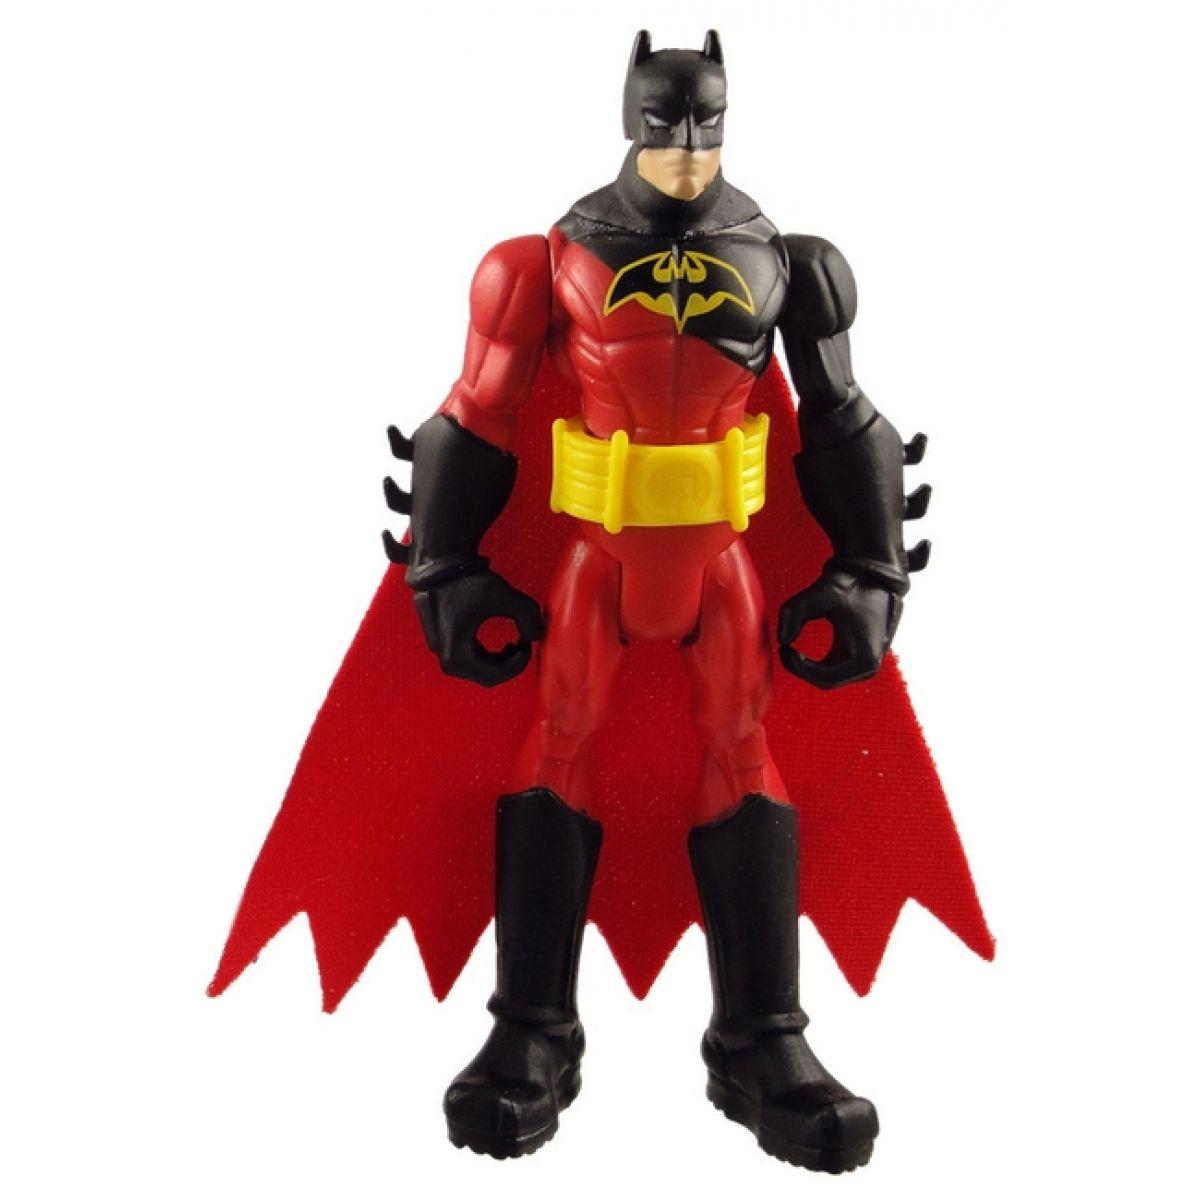 Mattel Batman Kolekce figurek - Červená